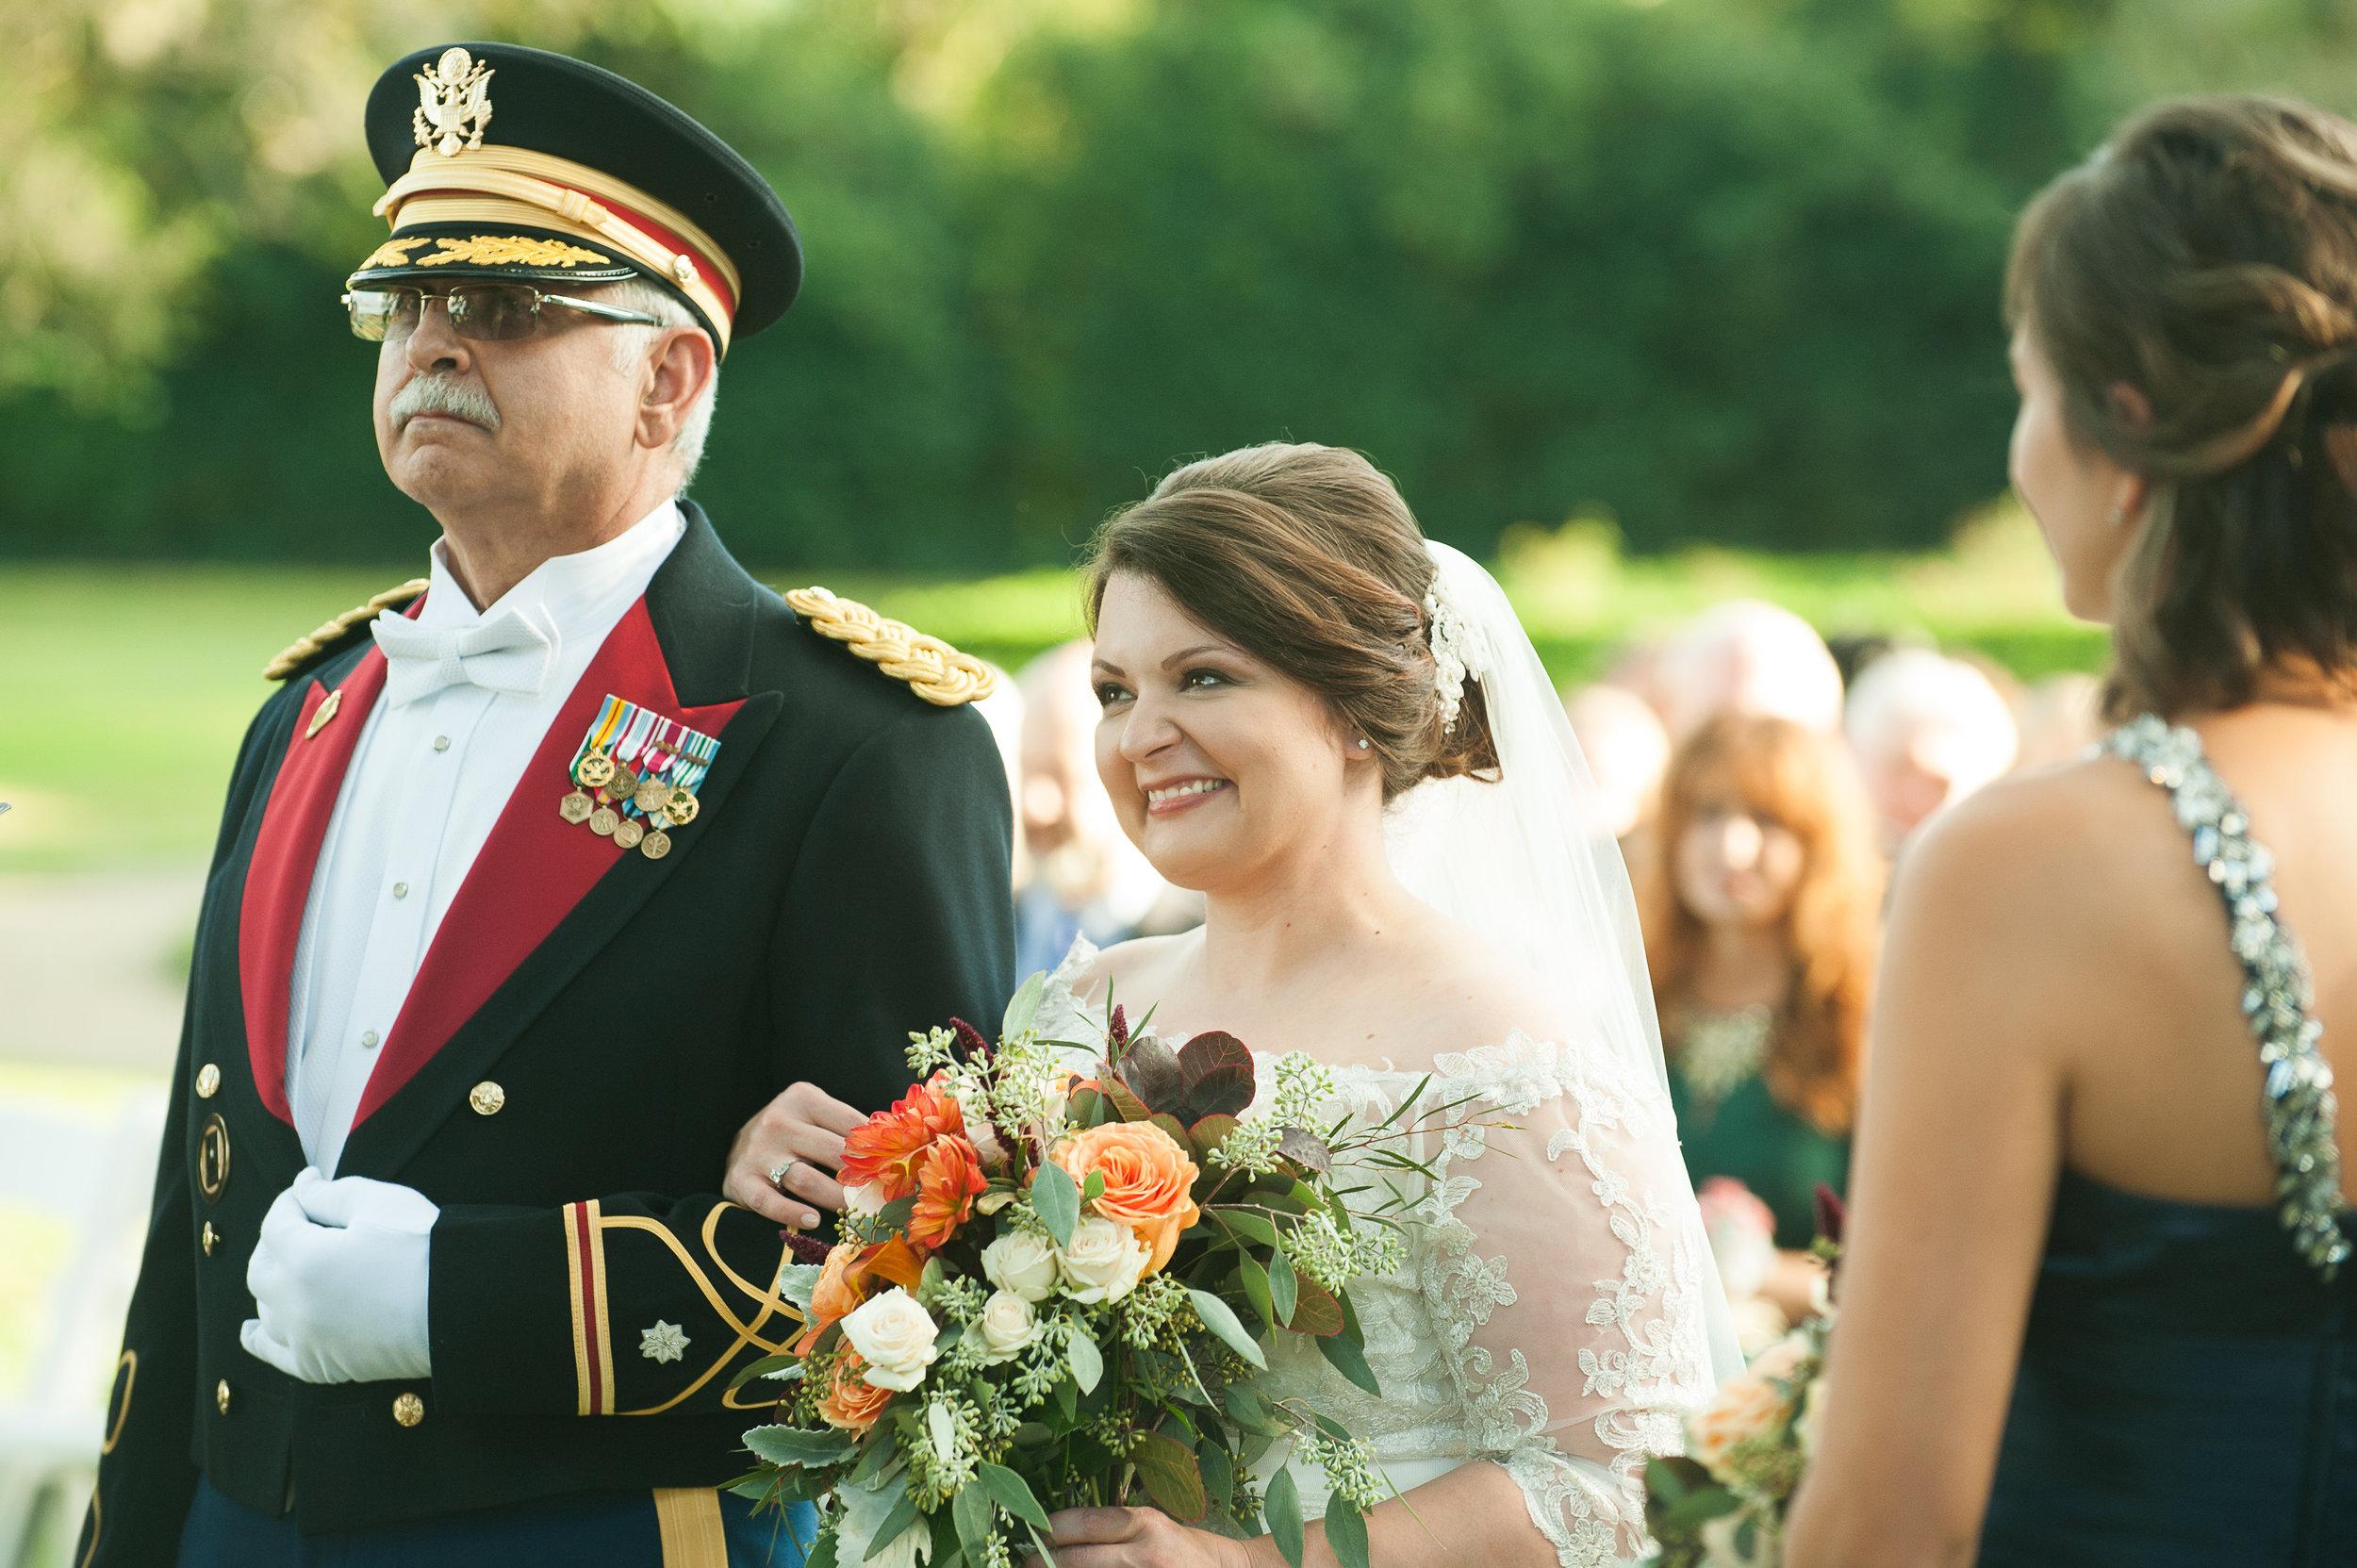 Mezzetti_Rutherford_Reese_Moore_Weddings_RTM5007.jpg